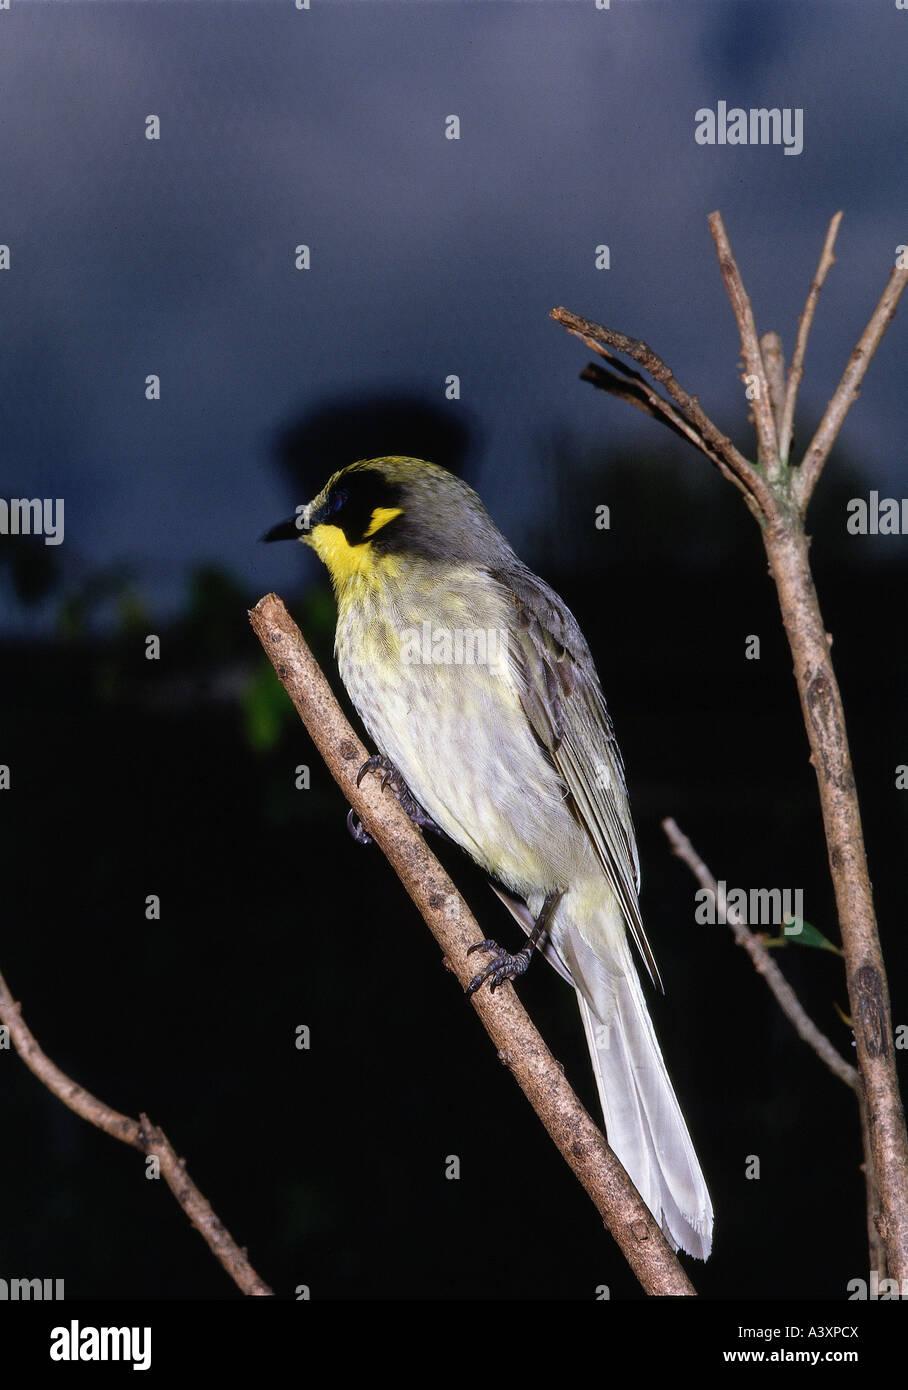 zoology / animals, avian / birds, Yellow-tufted Honeyeater, (Lichenostomus melanops), sitting on branch, distribution: - Stock Image